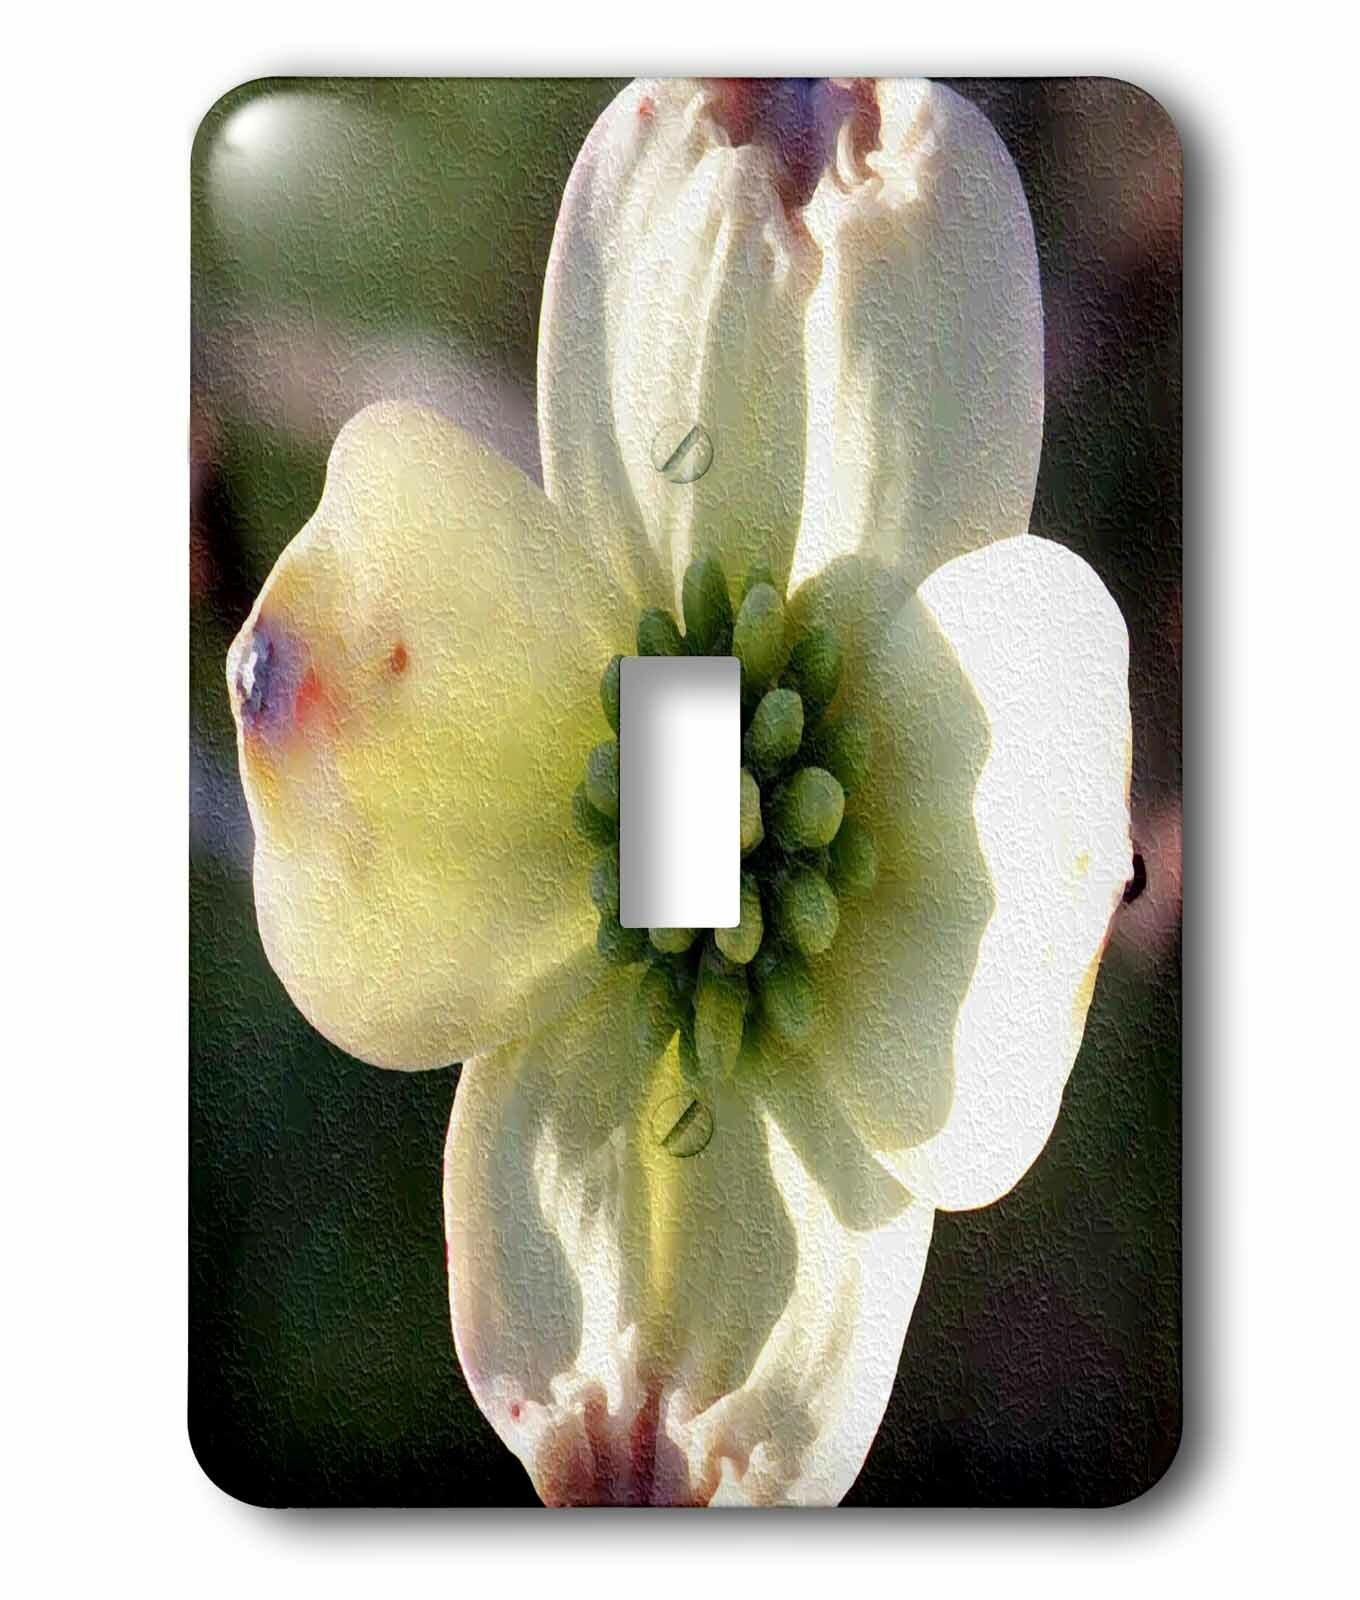 3drose Dogwood Bloom 1 Gang Toggle Light Switch Wall Plate Wayfair